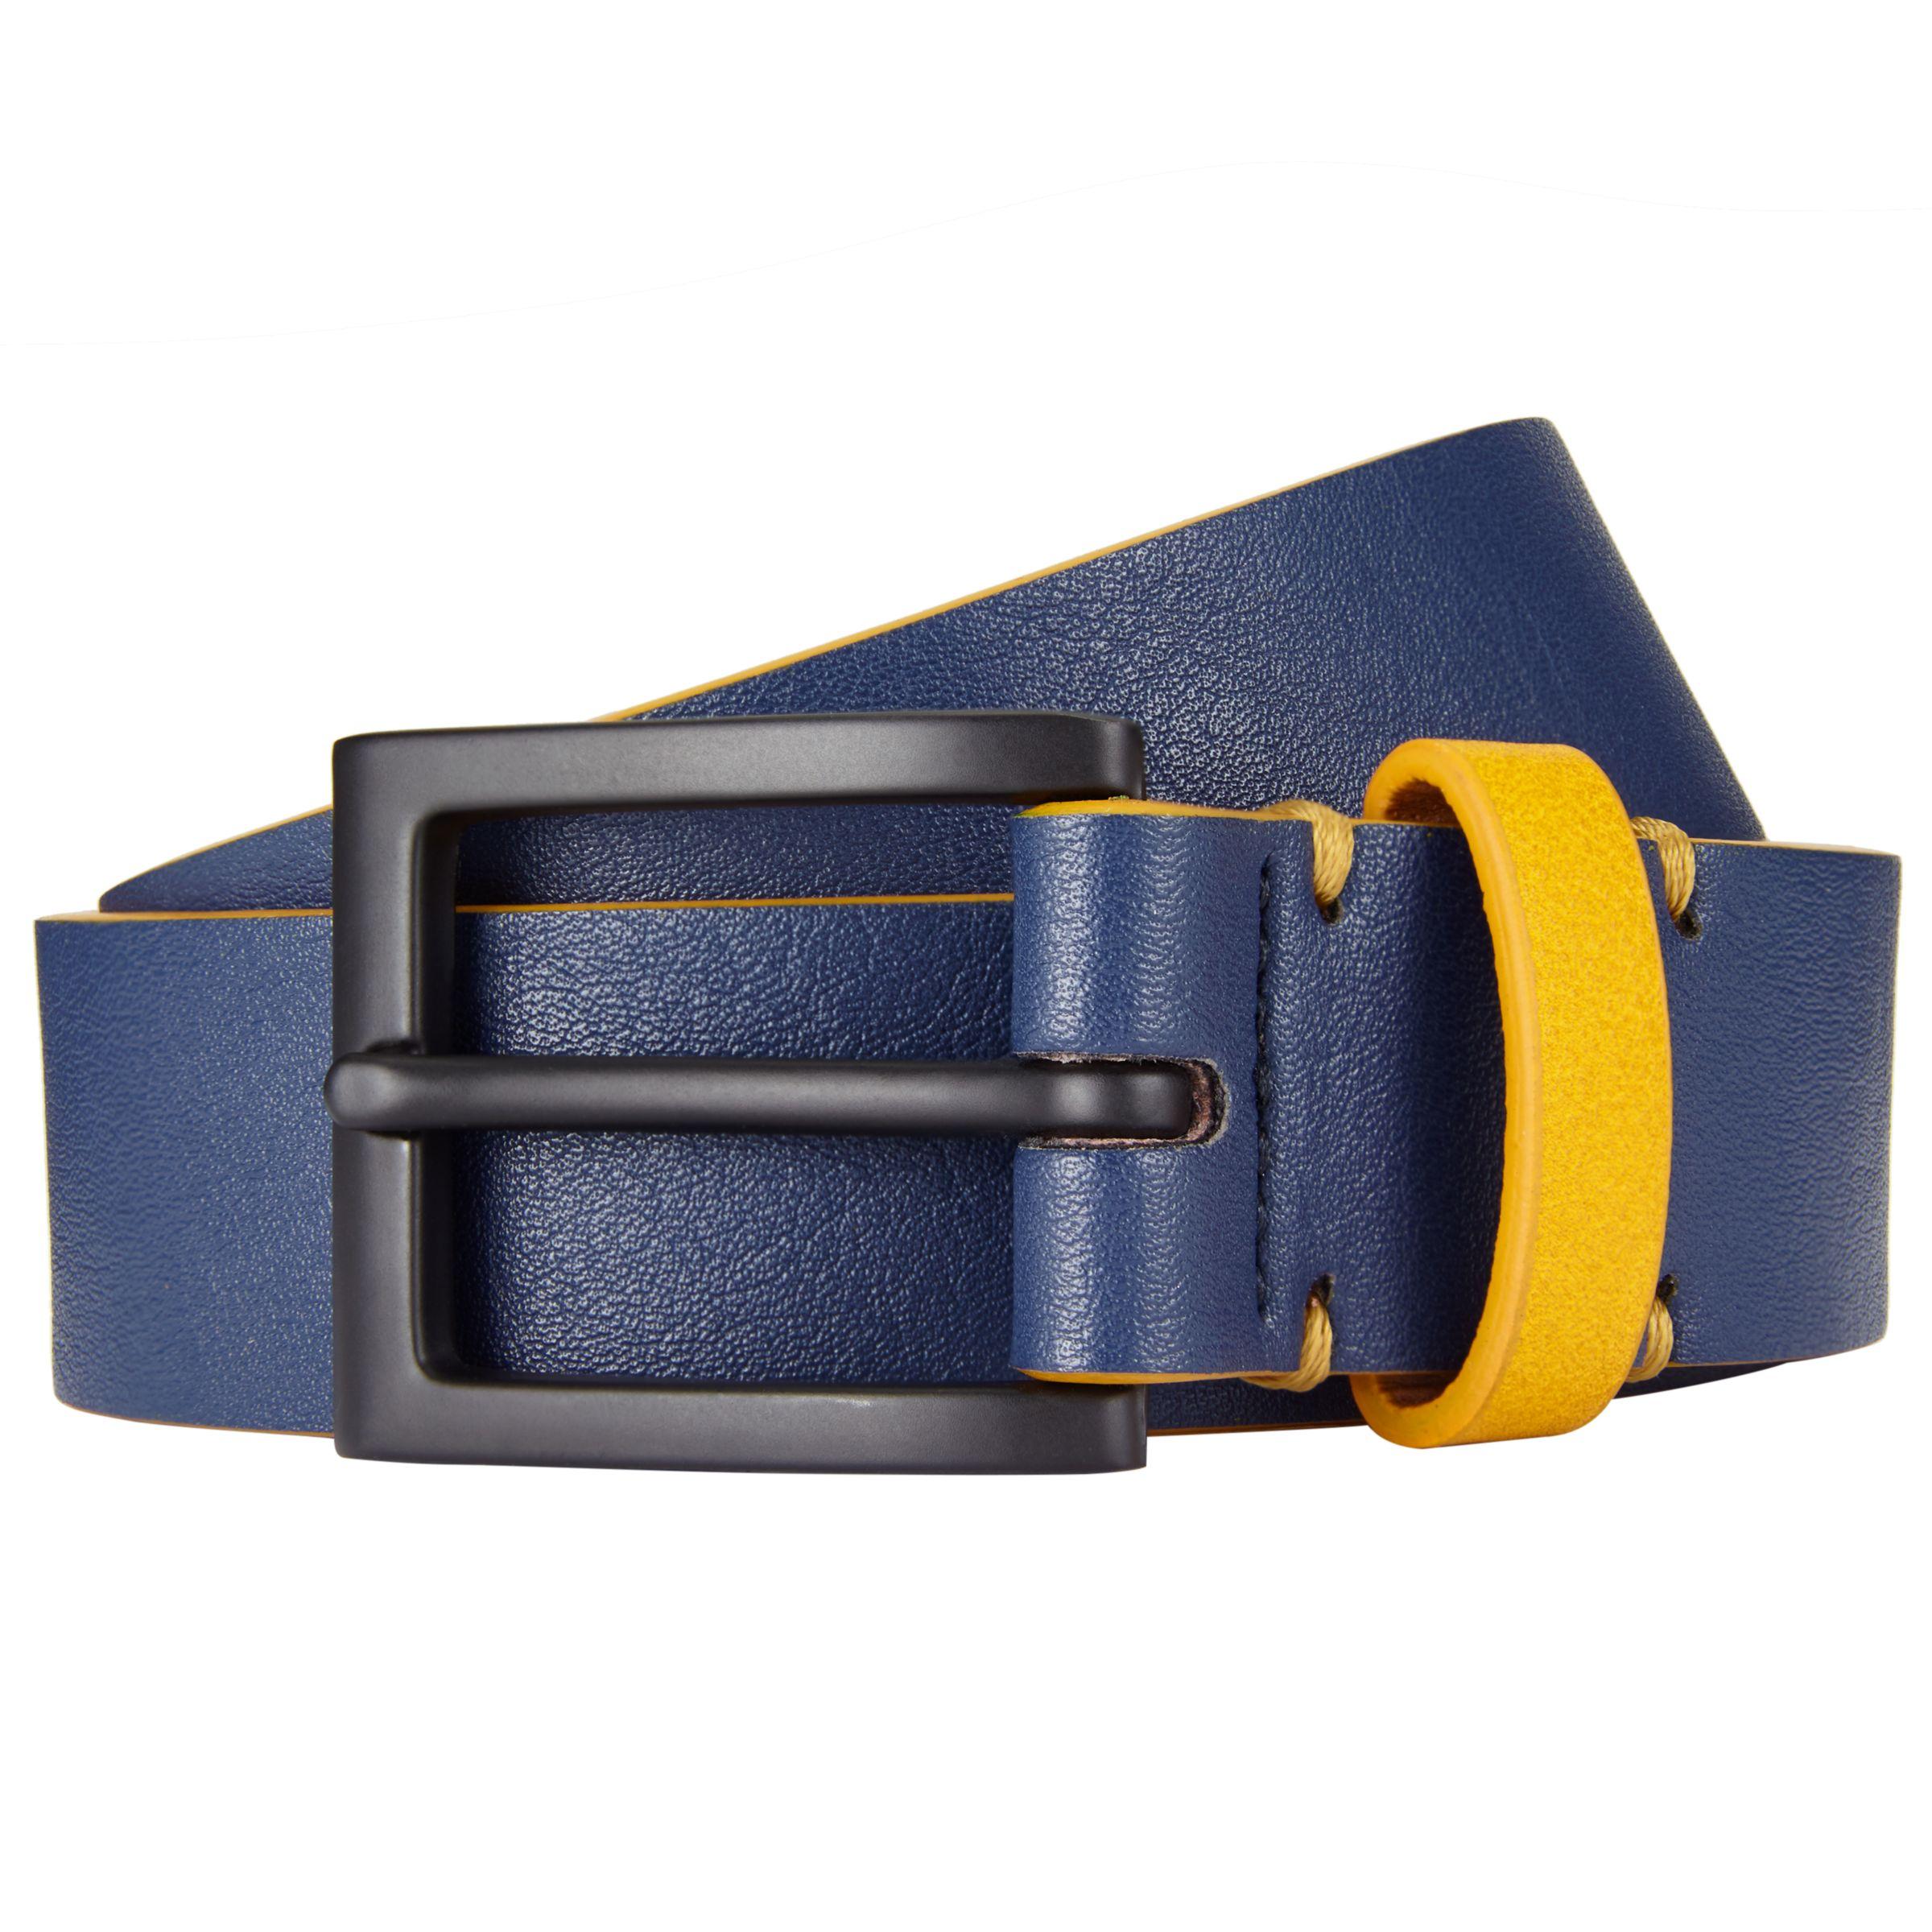 Kin by John Lewis Kin by John Lewis Coloured Keeper Belt, Navy/Yellow